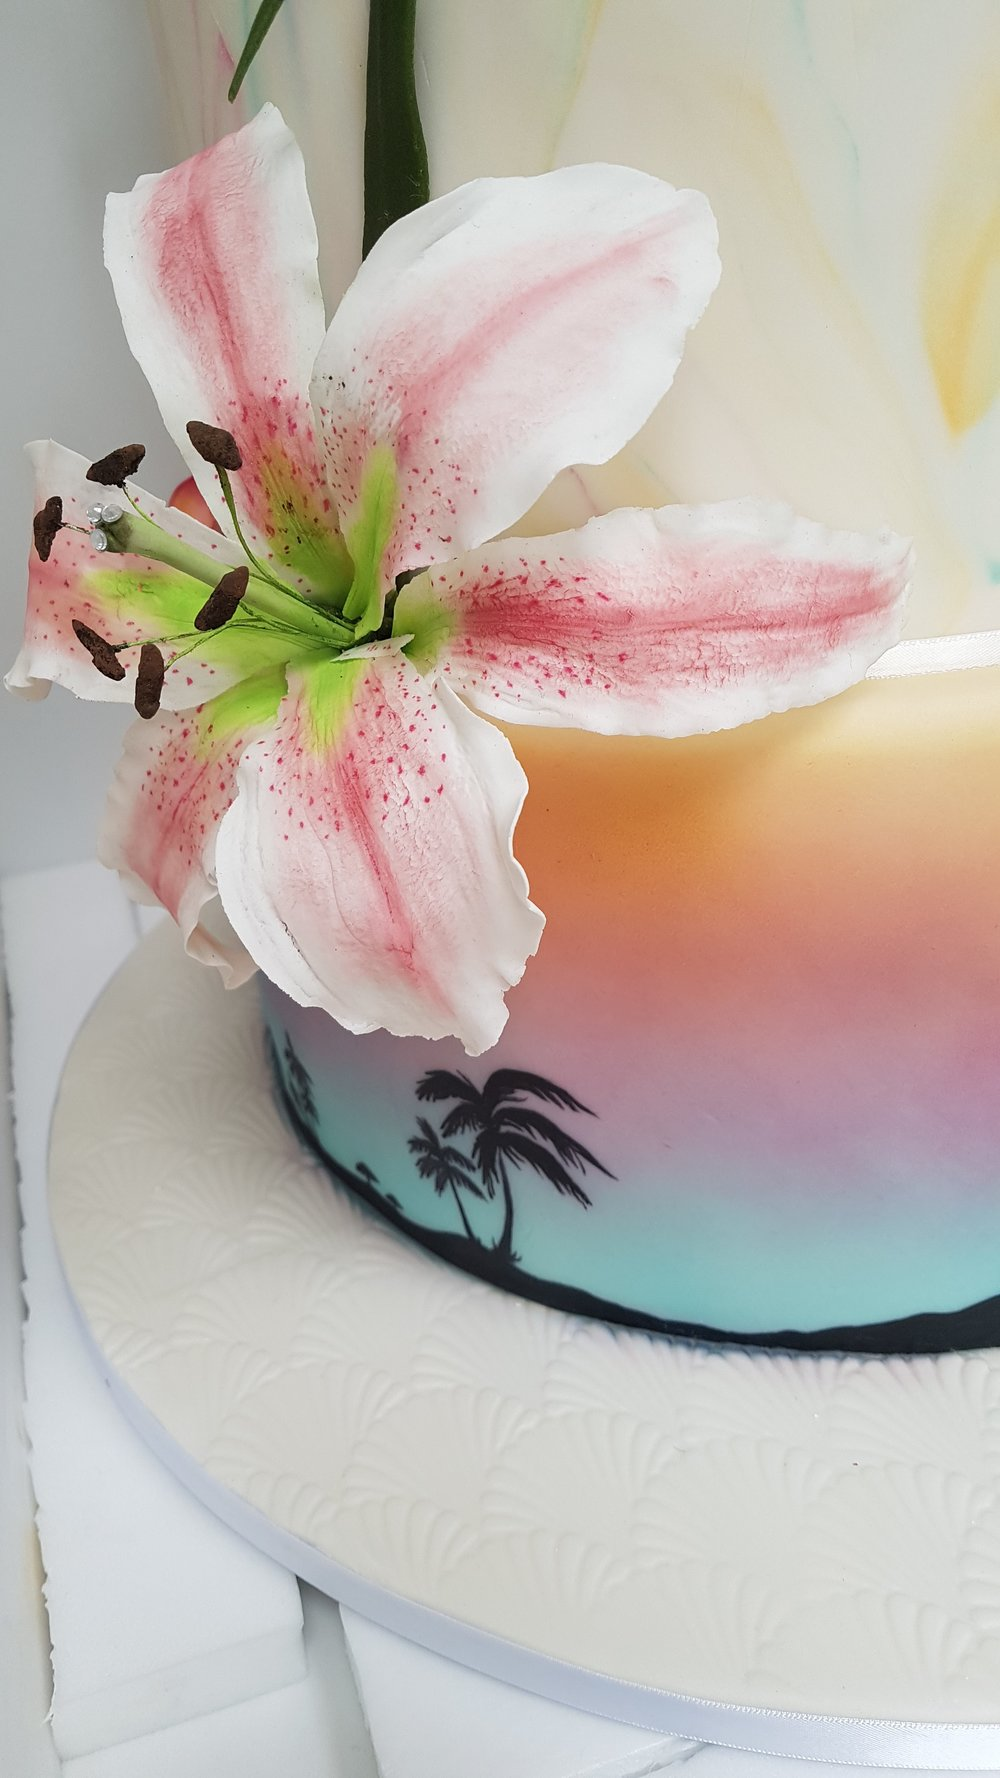 Sugar Lily Handmade